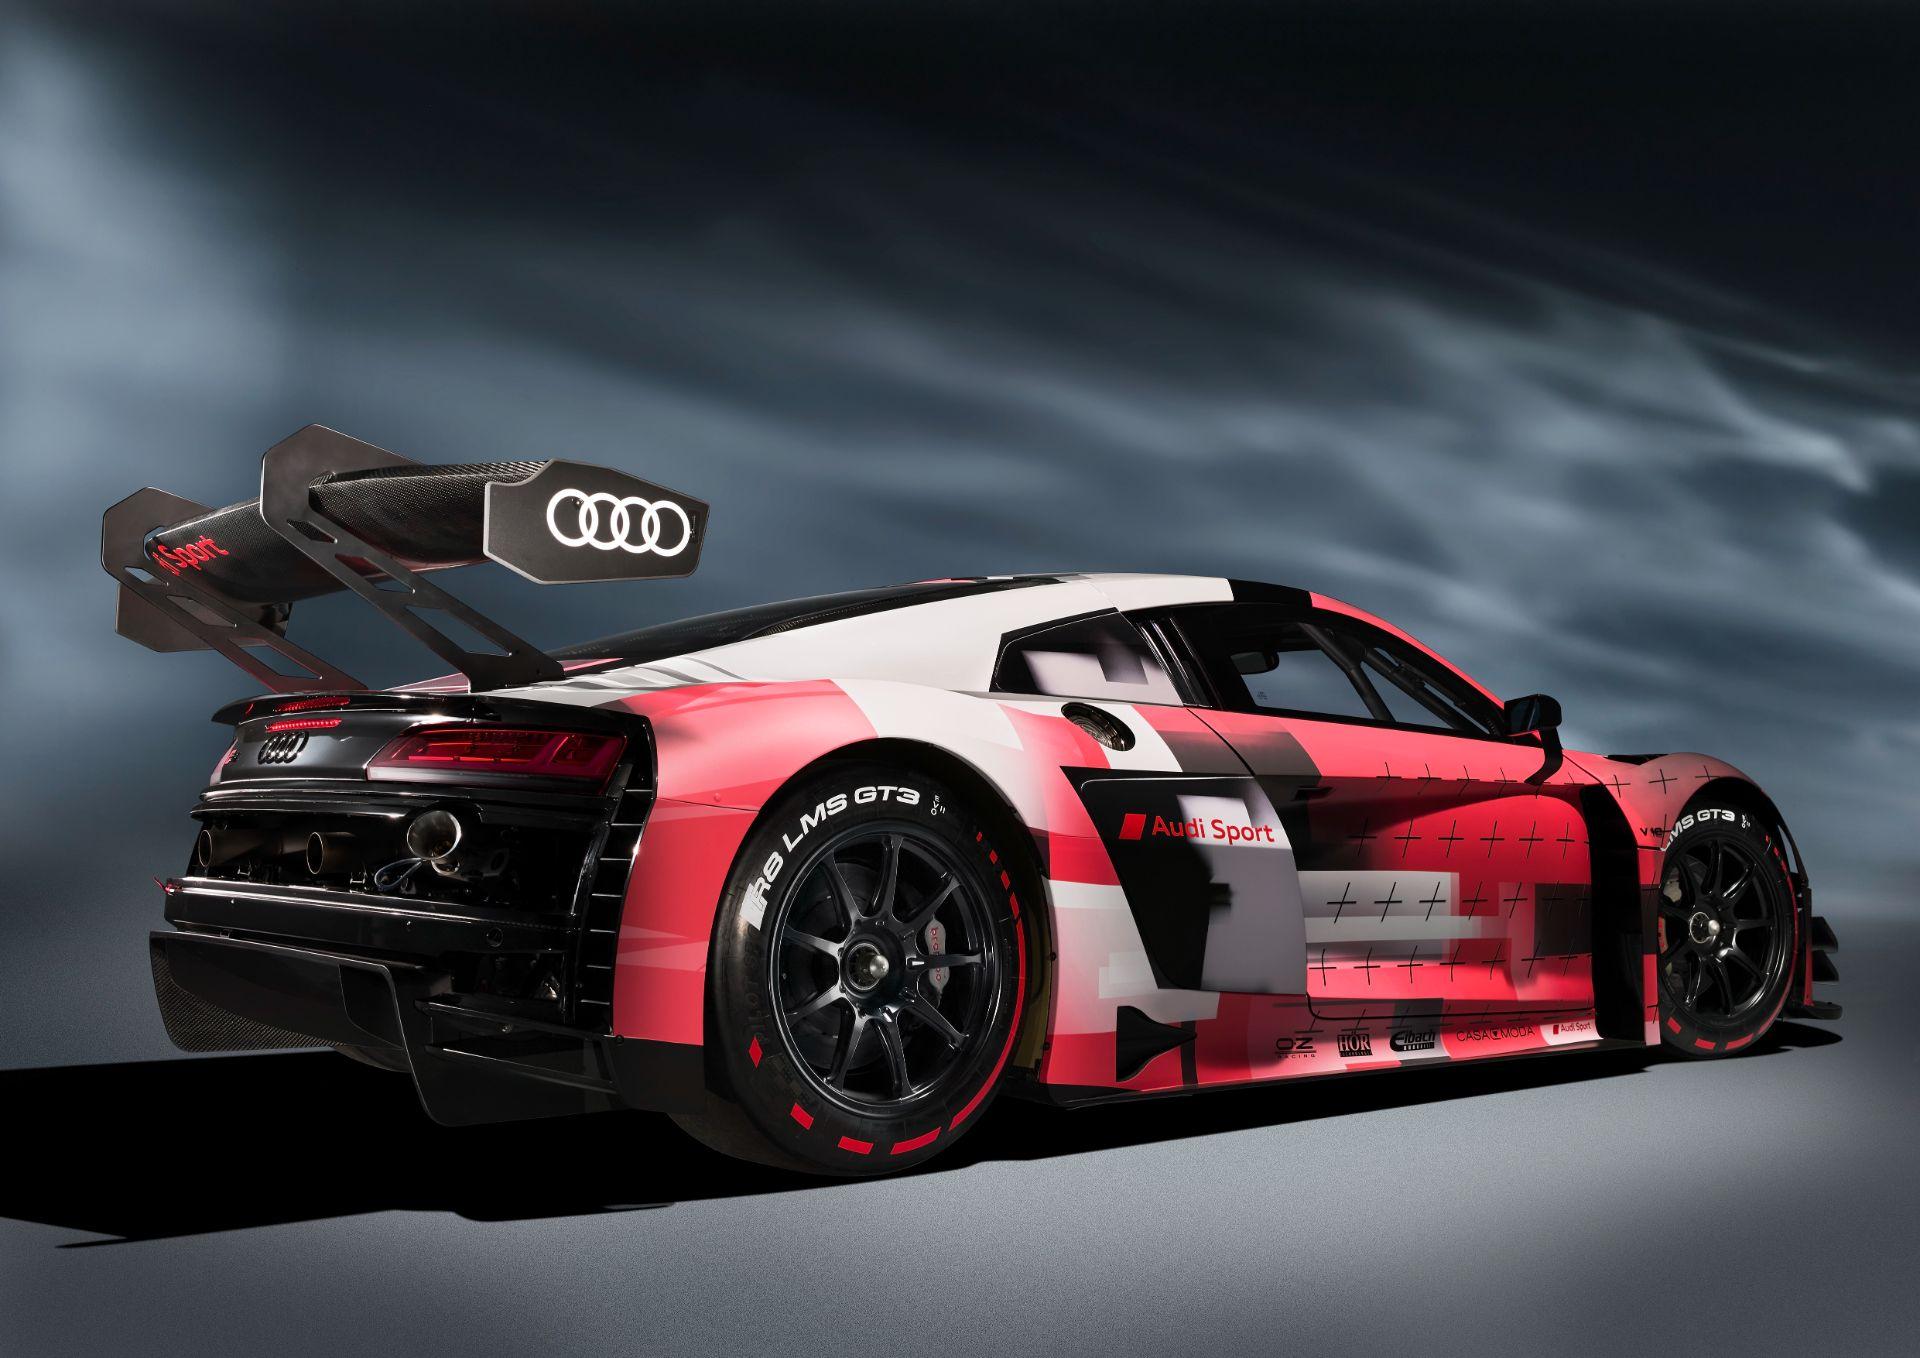 Audi-R8-LMS-GT3-Evo-II-4